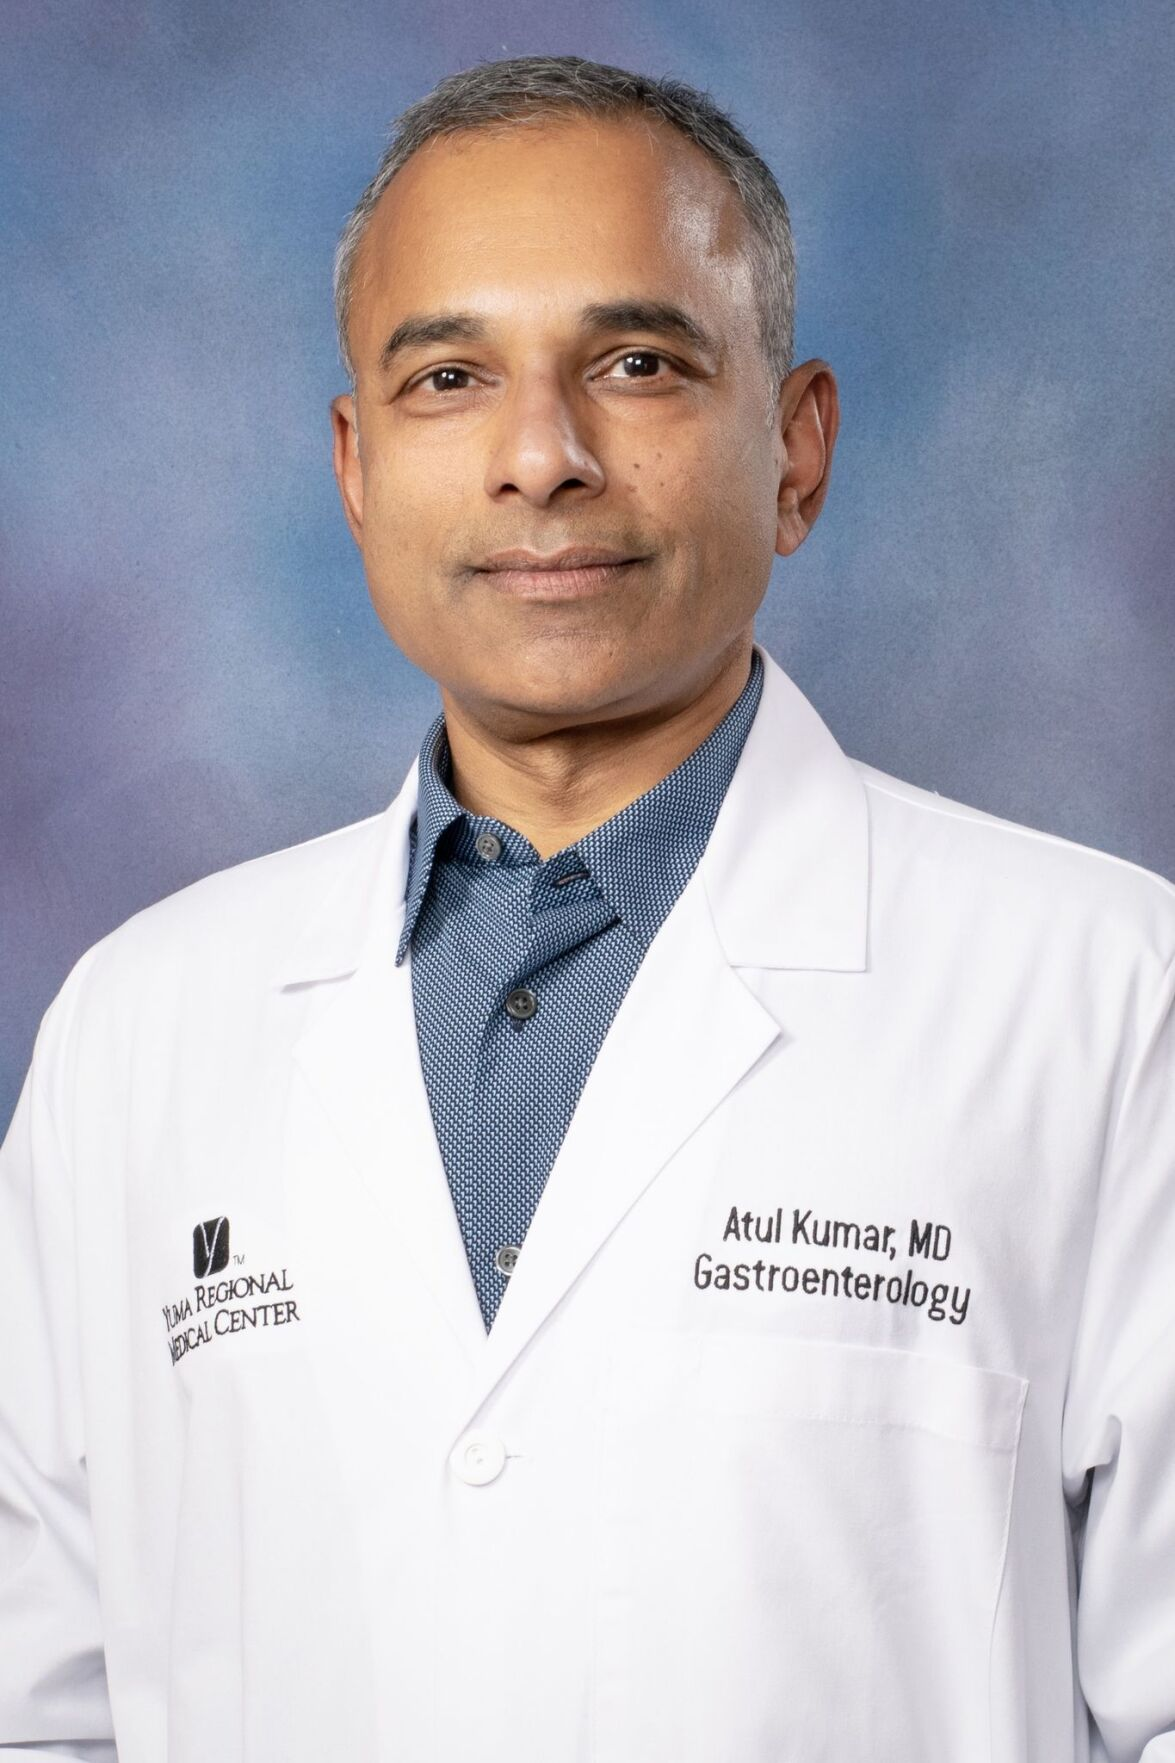 Namedropper: Dr. Atul Kumar